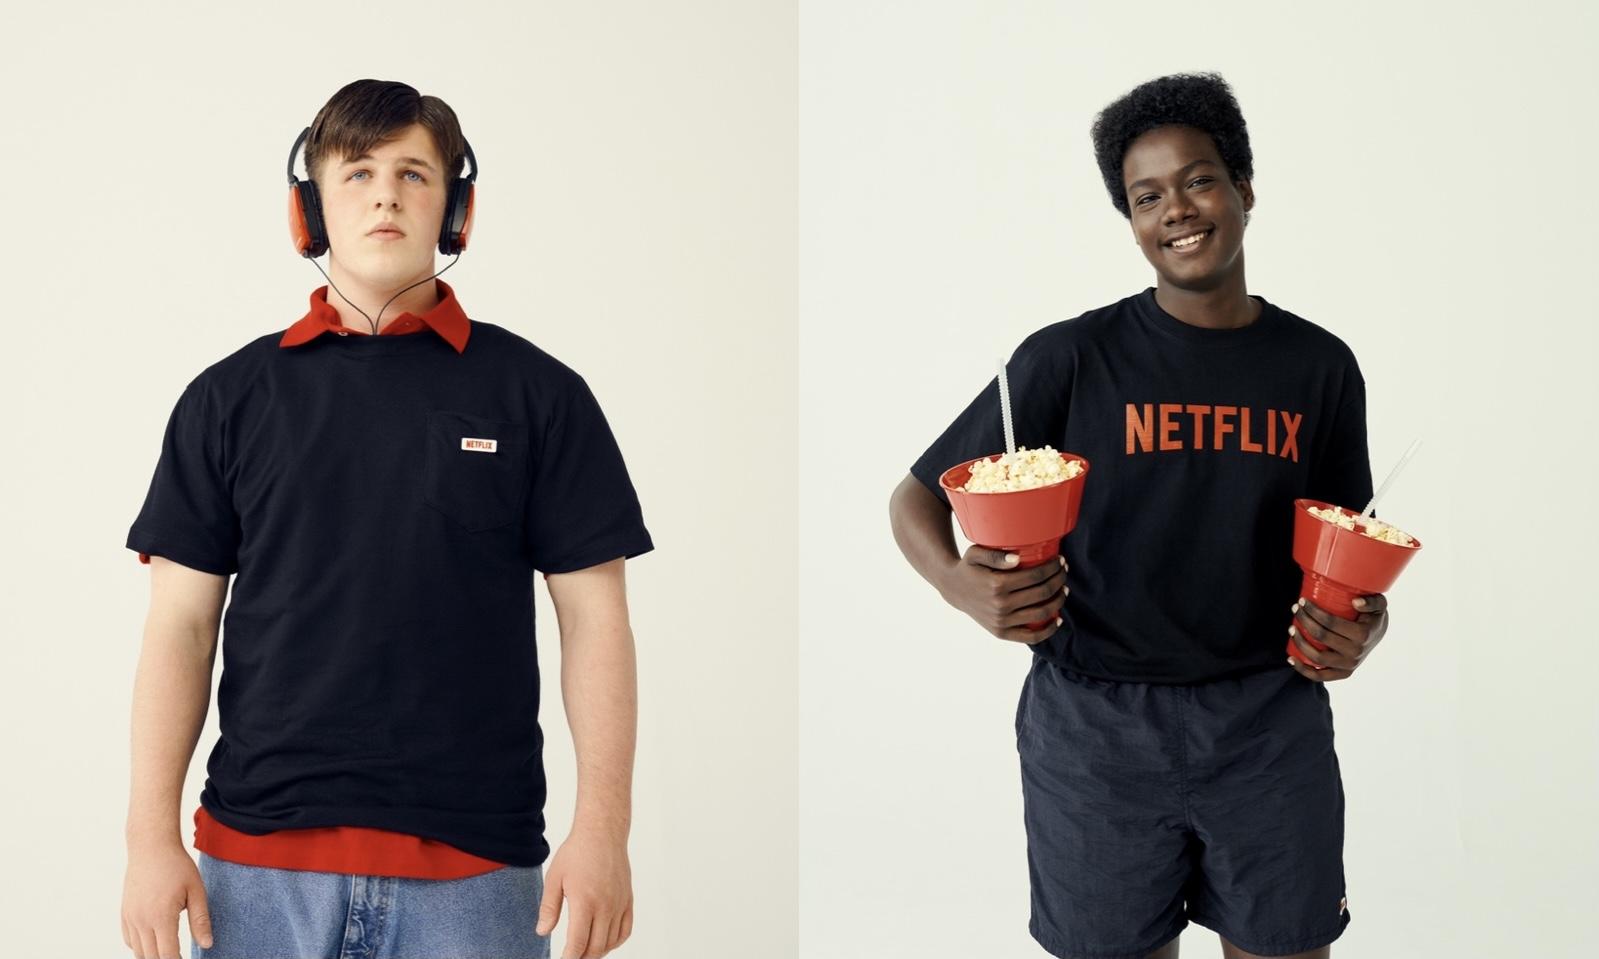 BEAMS、Netflixアニメと初コラボアイテム発売